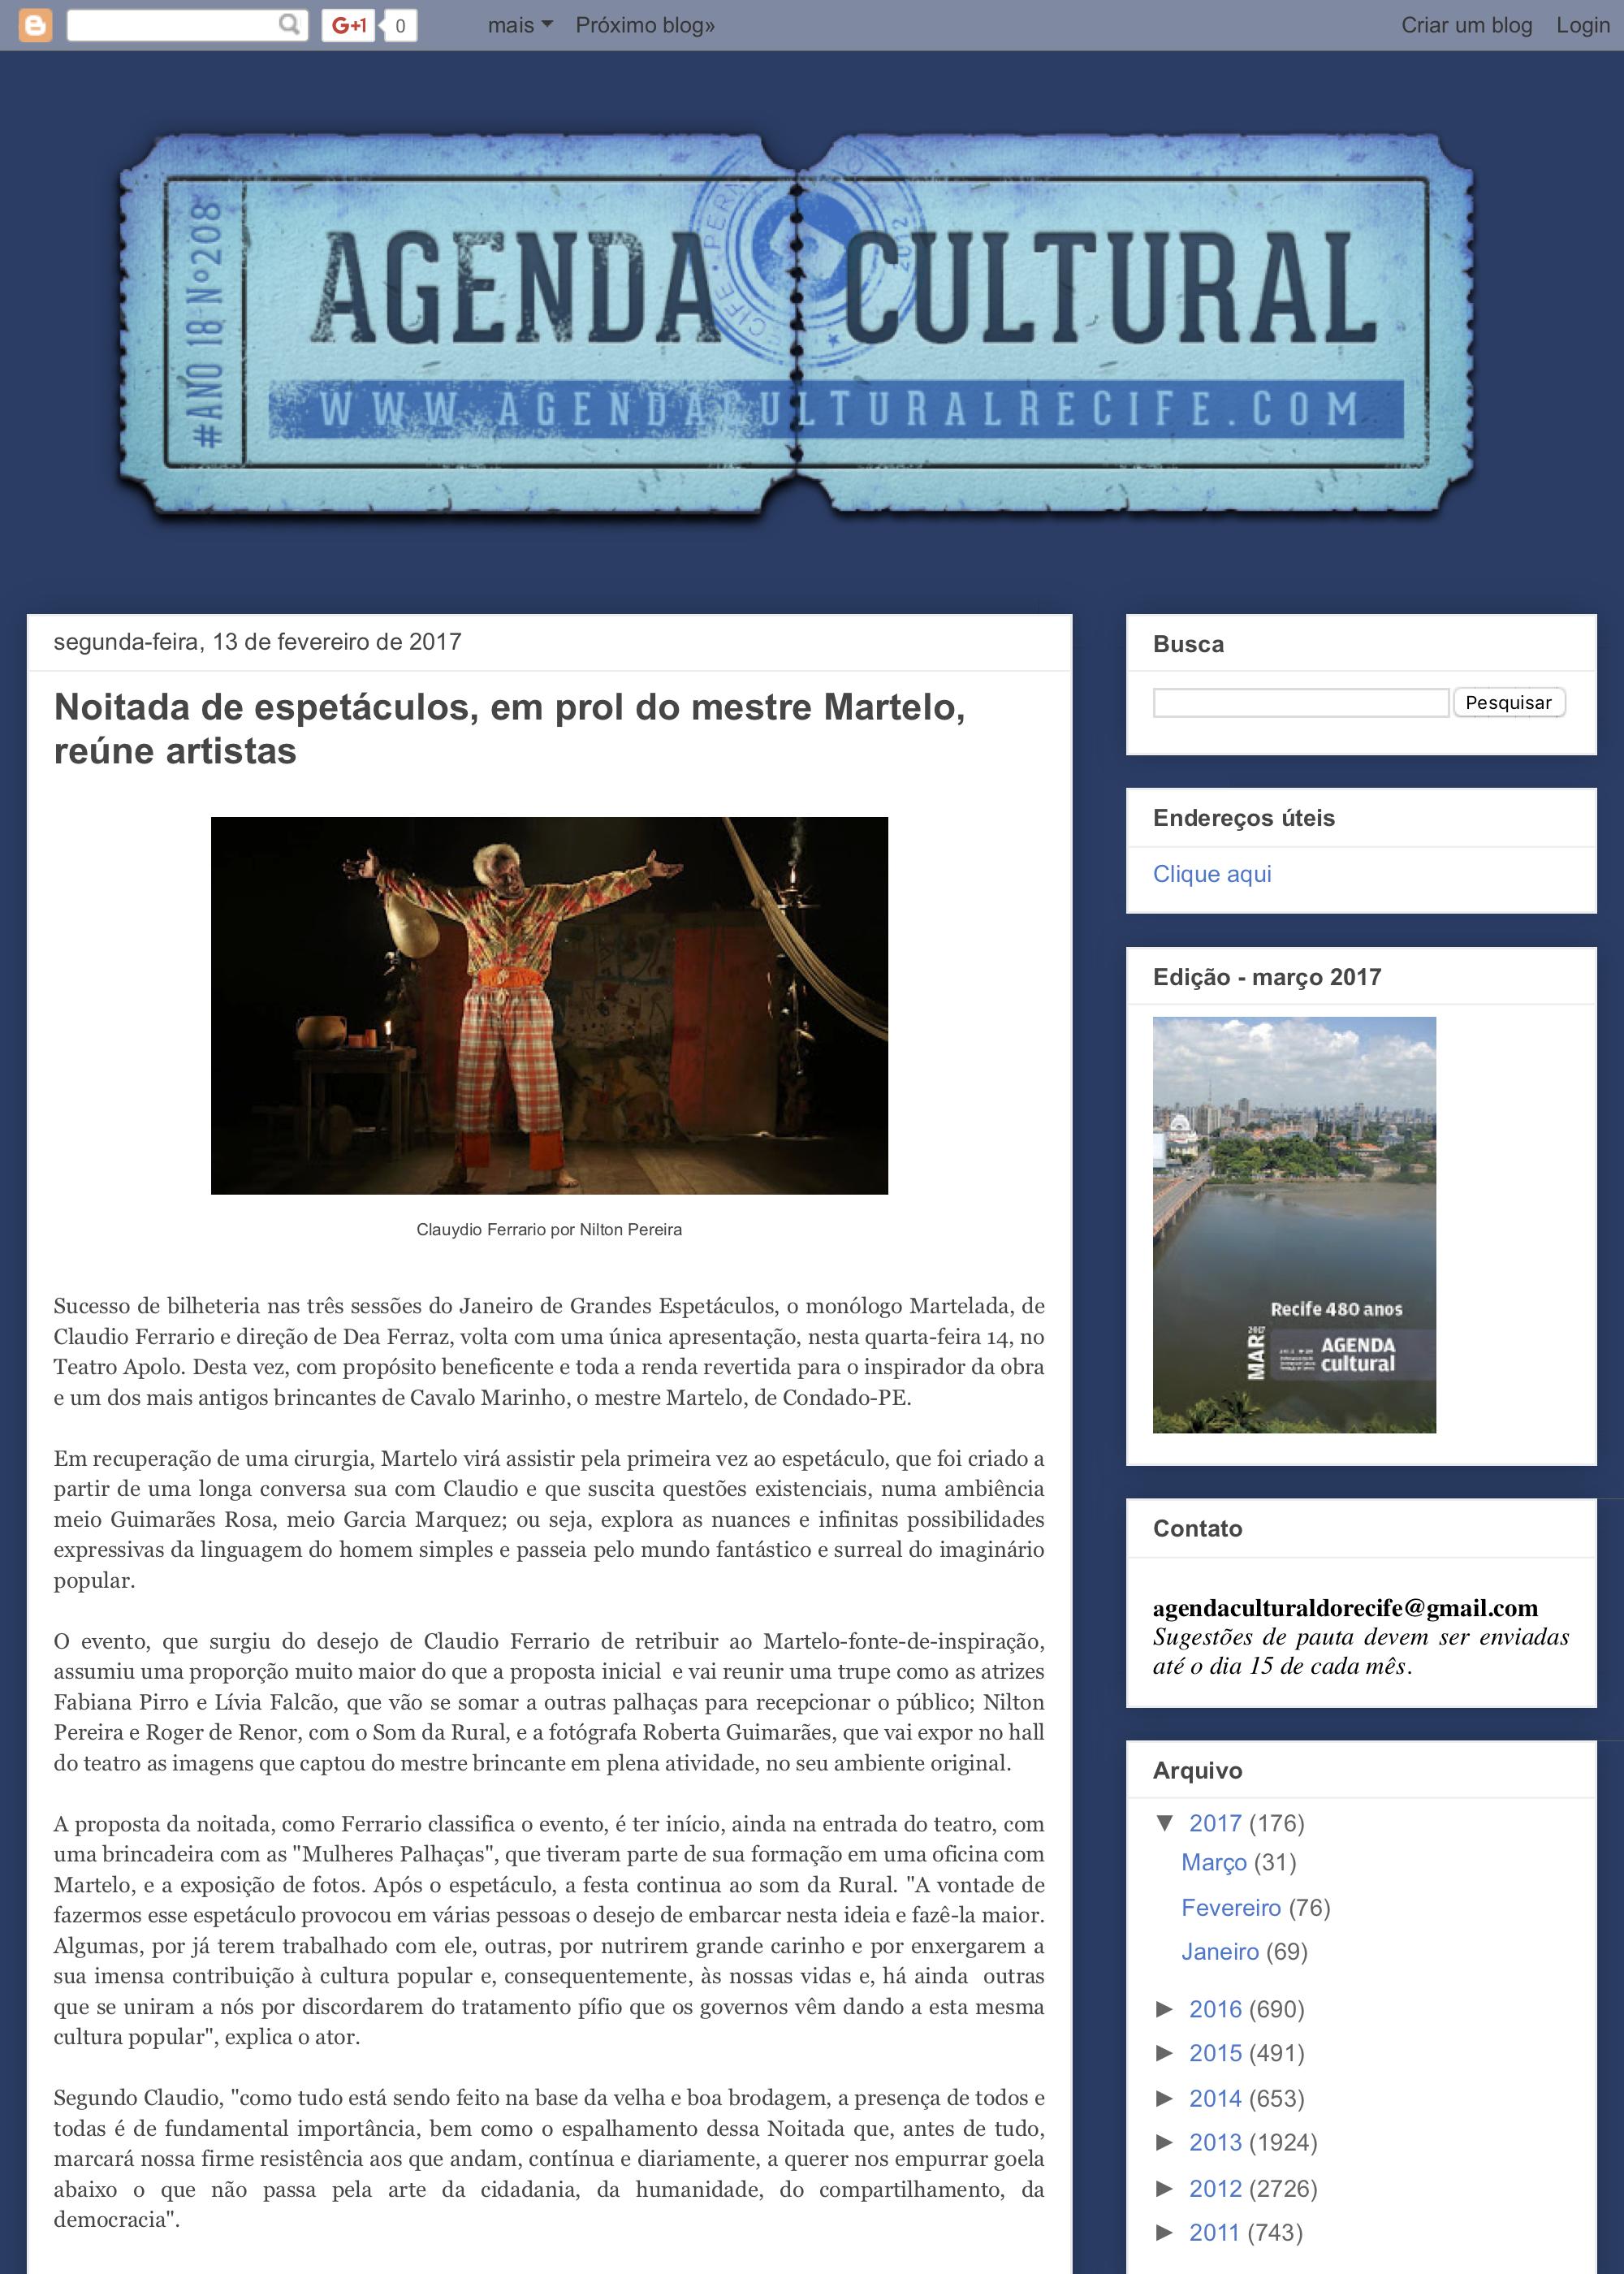 Agenda_Cultural_do_Recife__Noitada_de_es